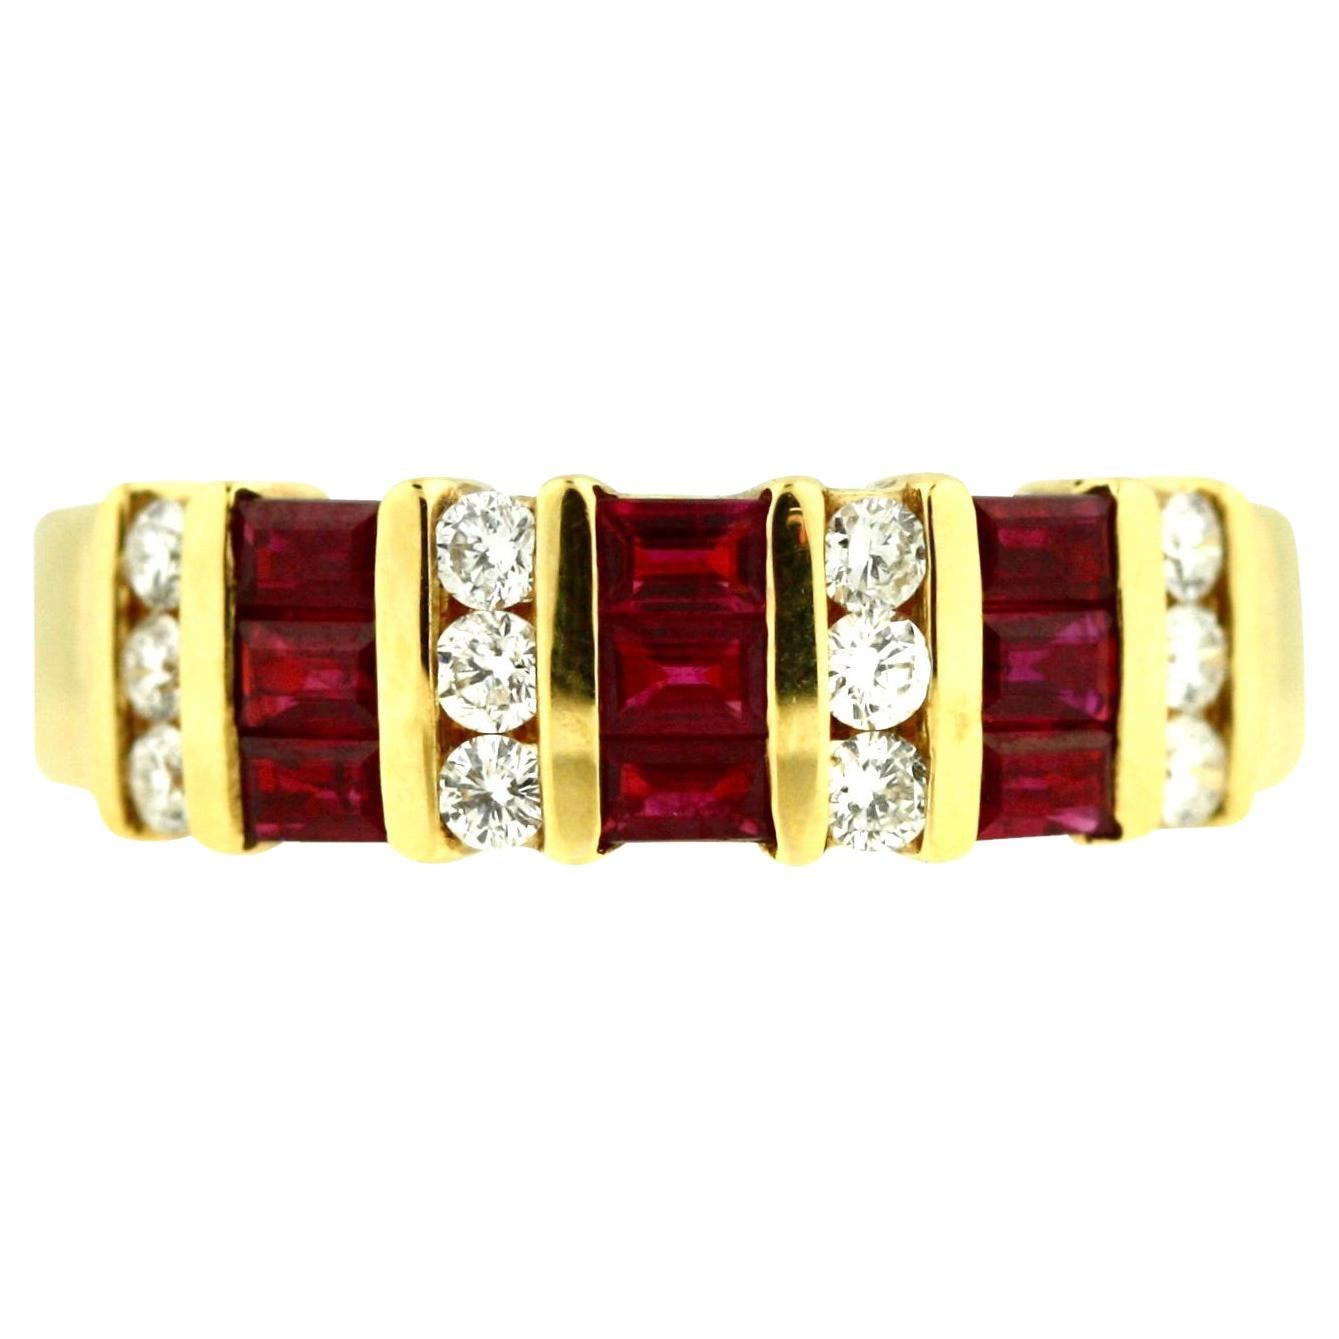 18 Karat Yellow Gold, Ruby and Diamond Ring